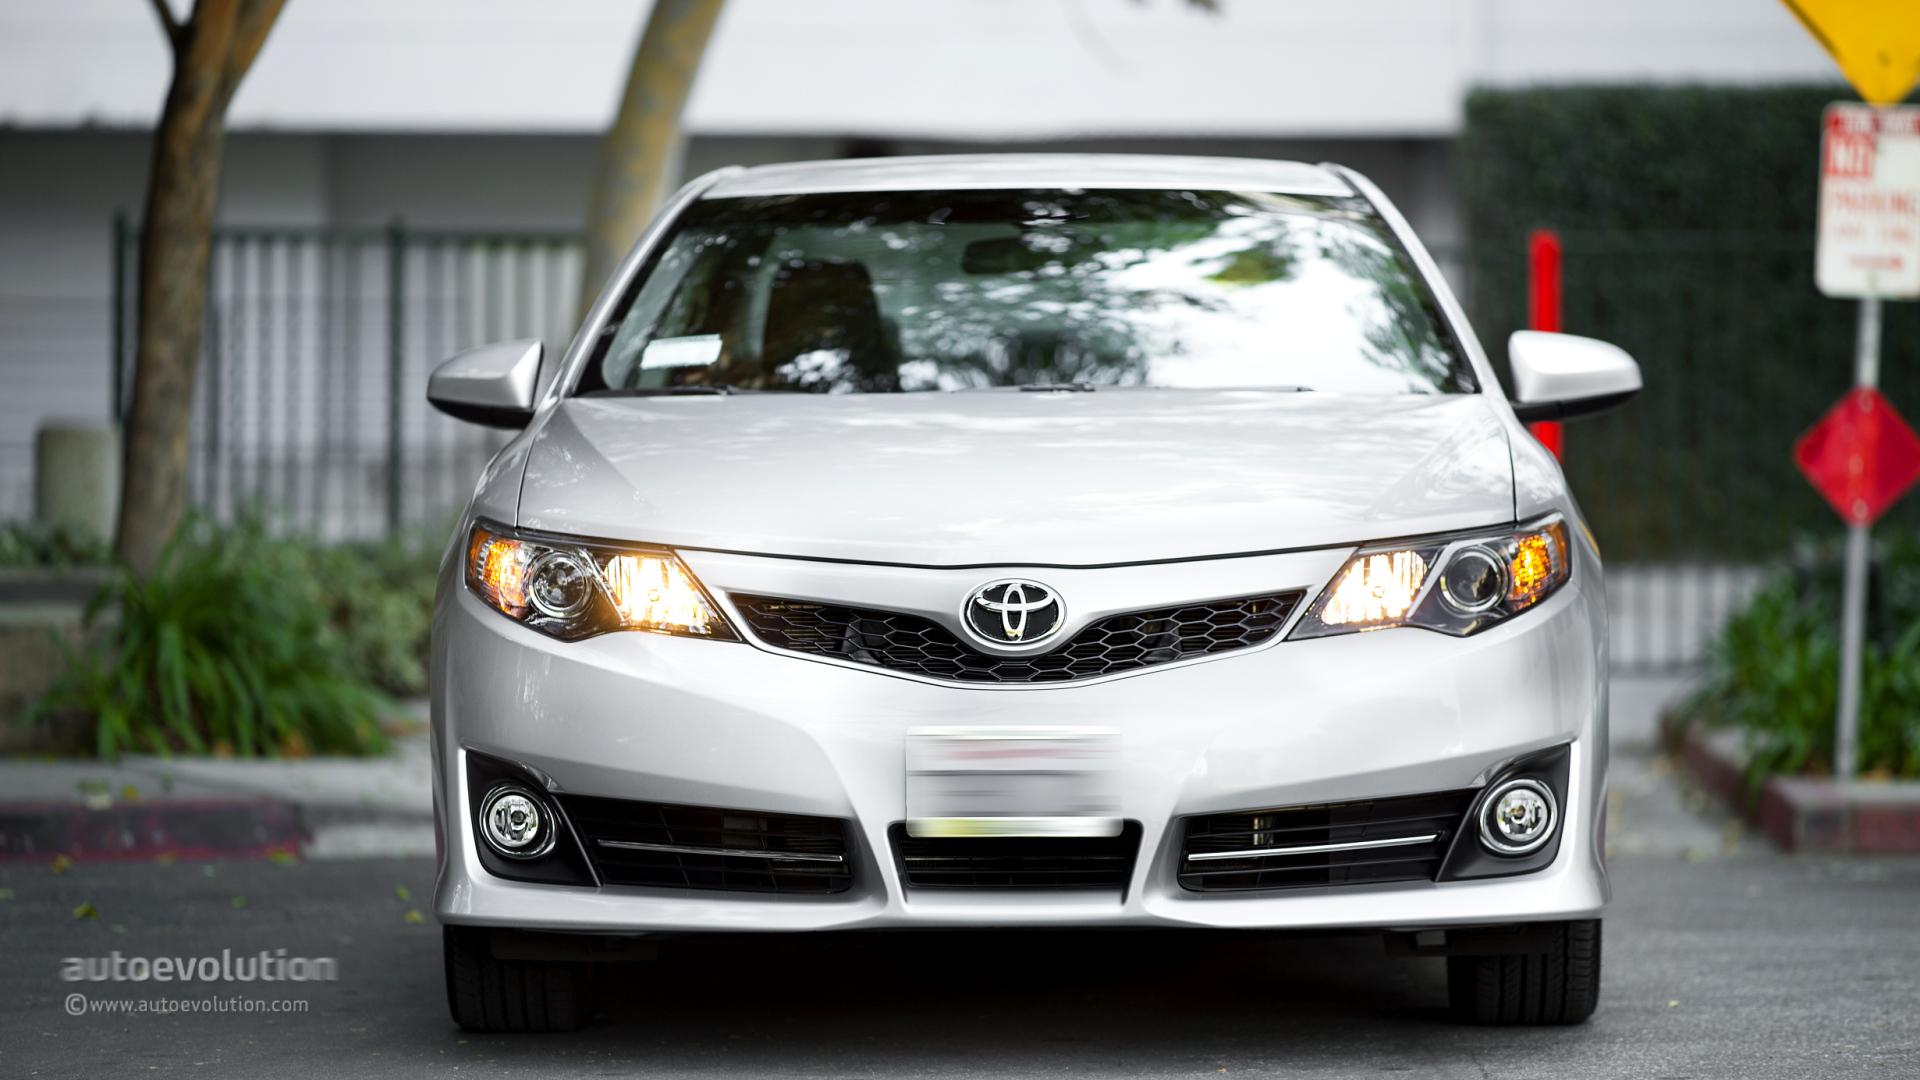 2014 TOYOTA Camry Review - autoevolution